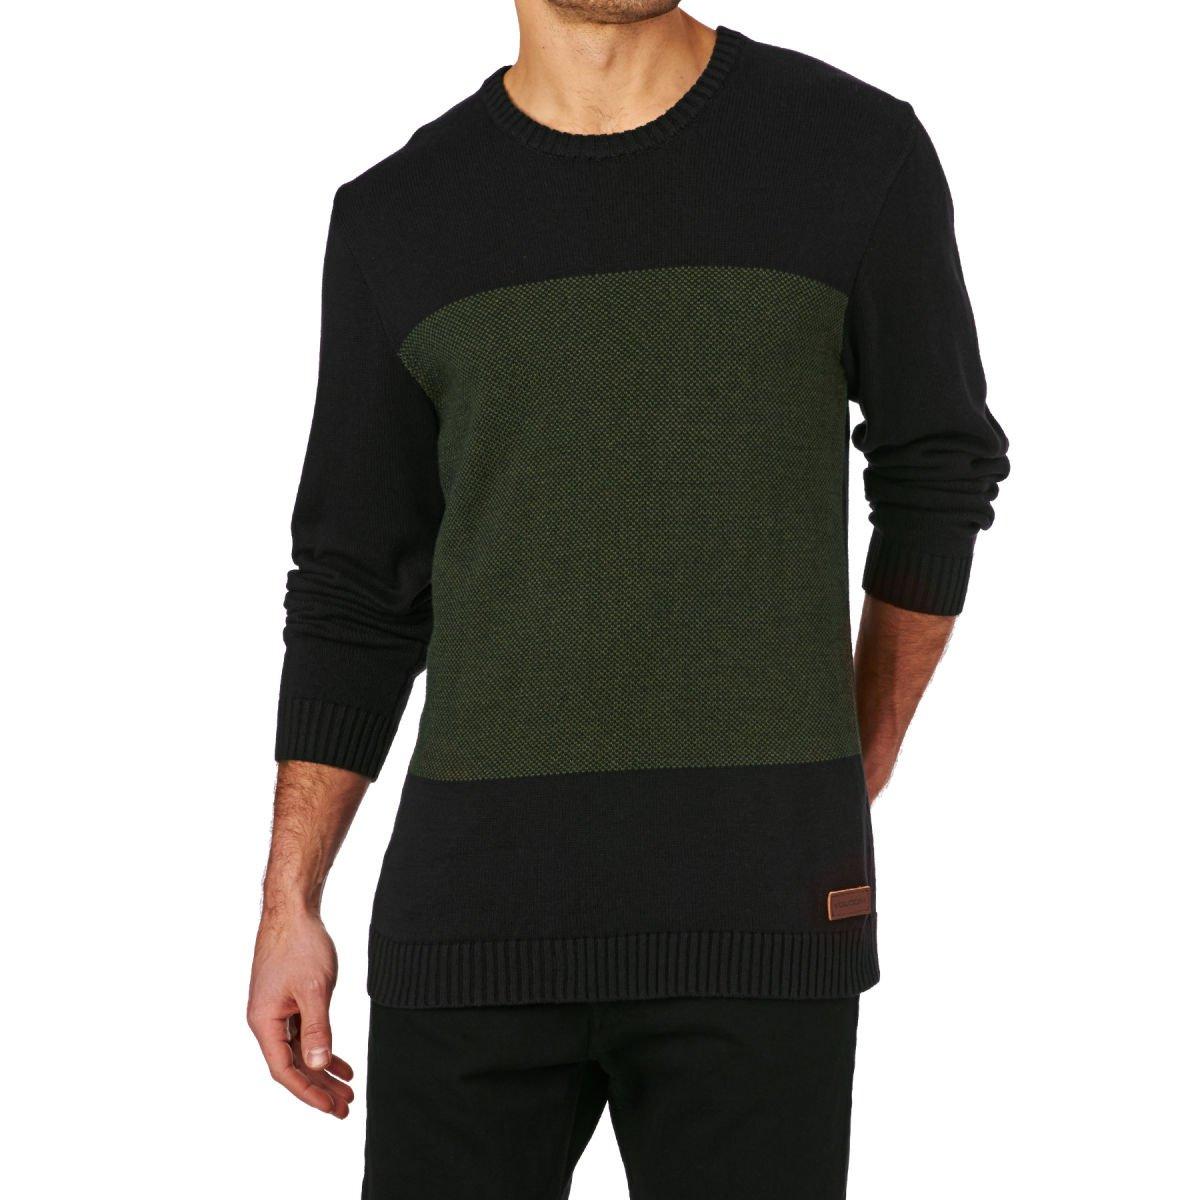 Volcom Herren Pulli Antys Crew Sweater